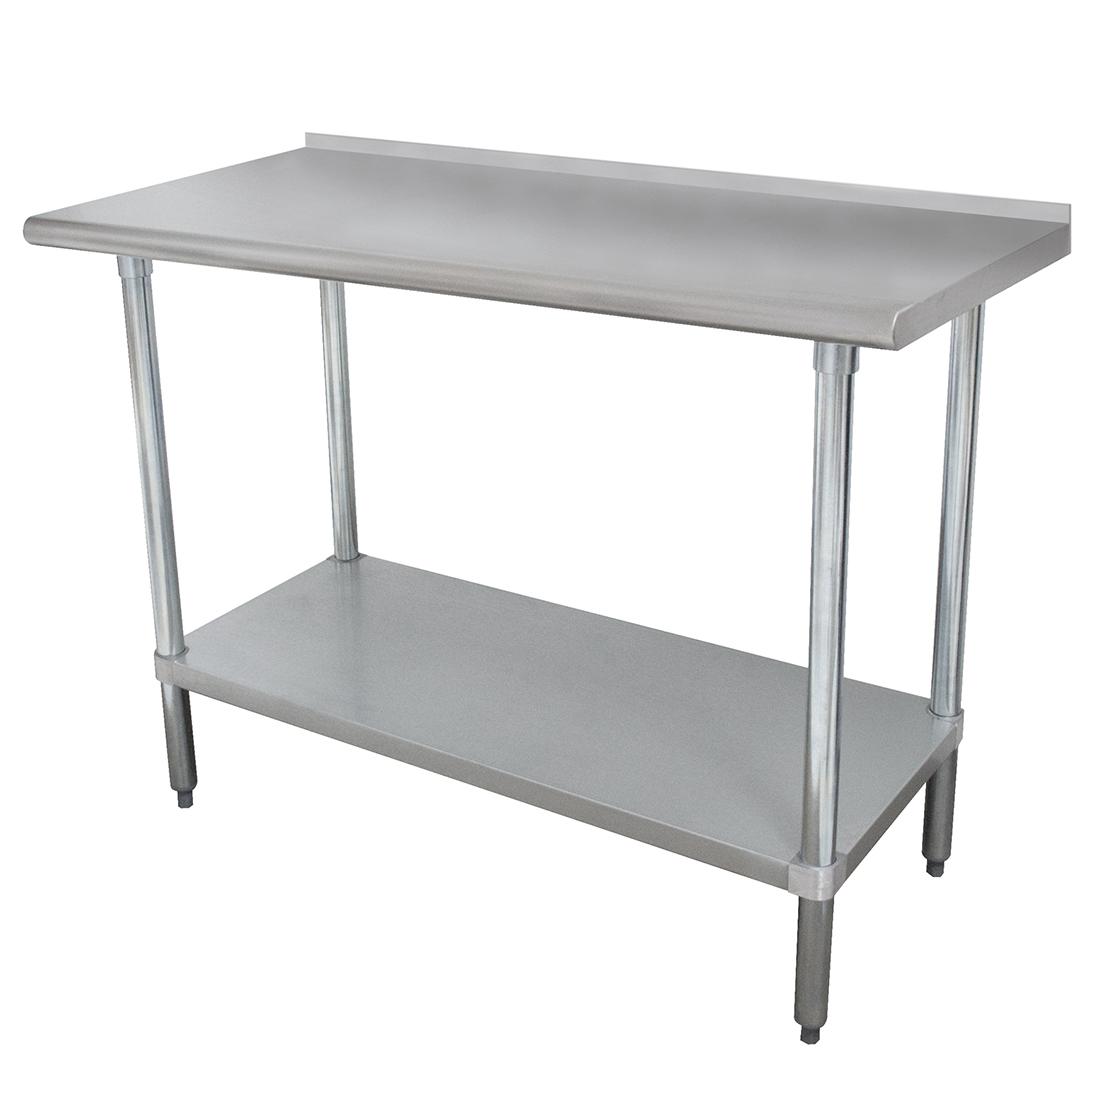 Advance Tabco FAG-369 work table,  97